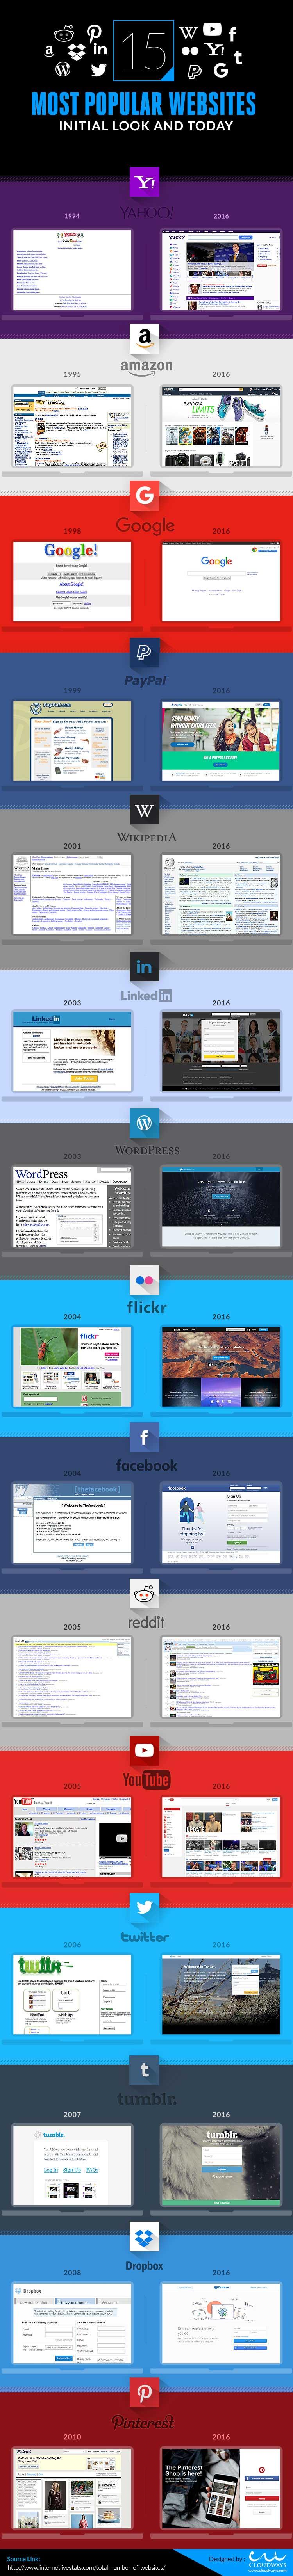 Most Popular Websites Infographic